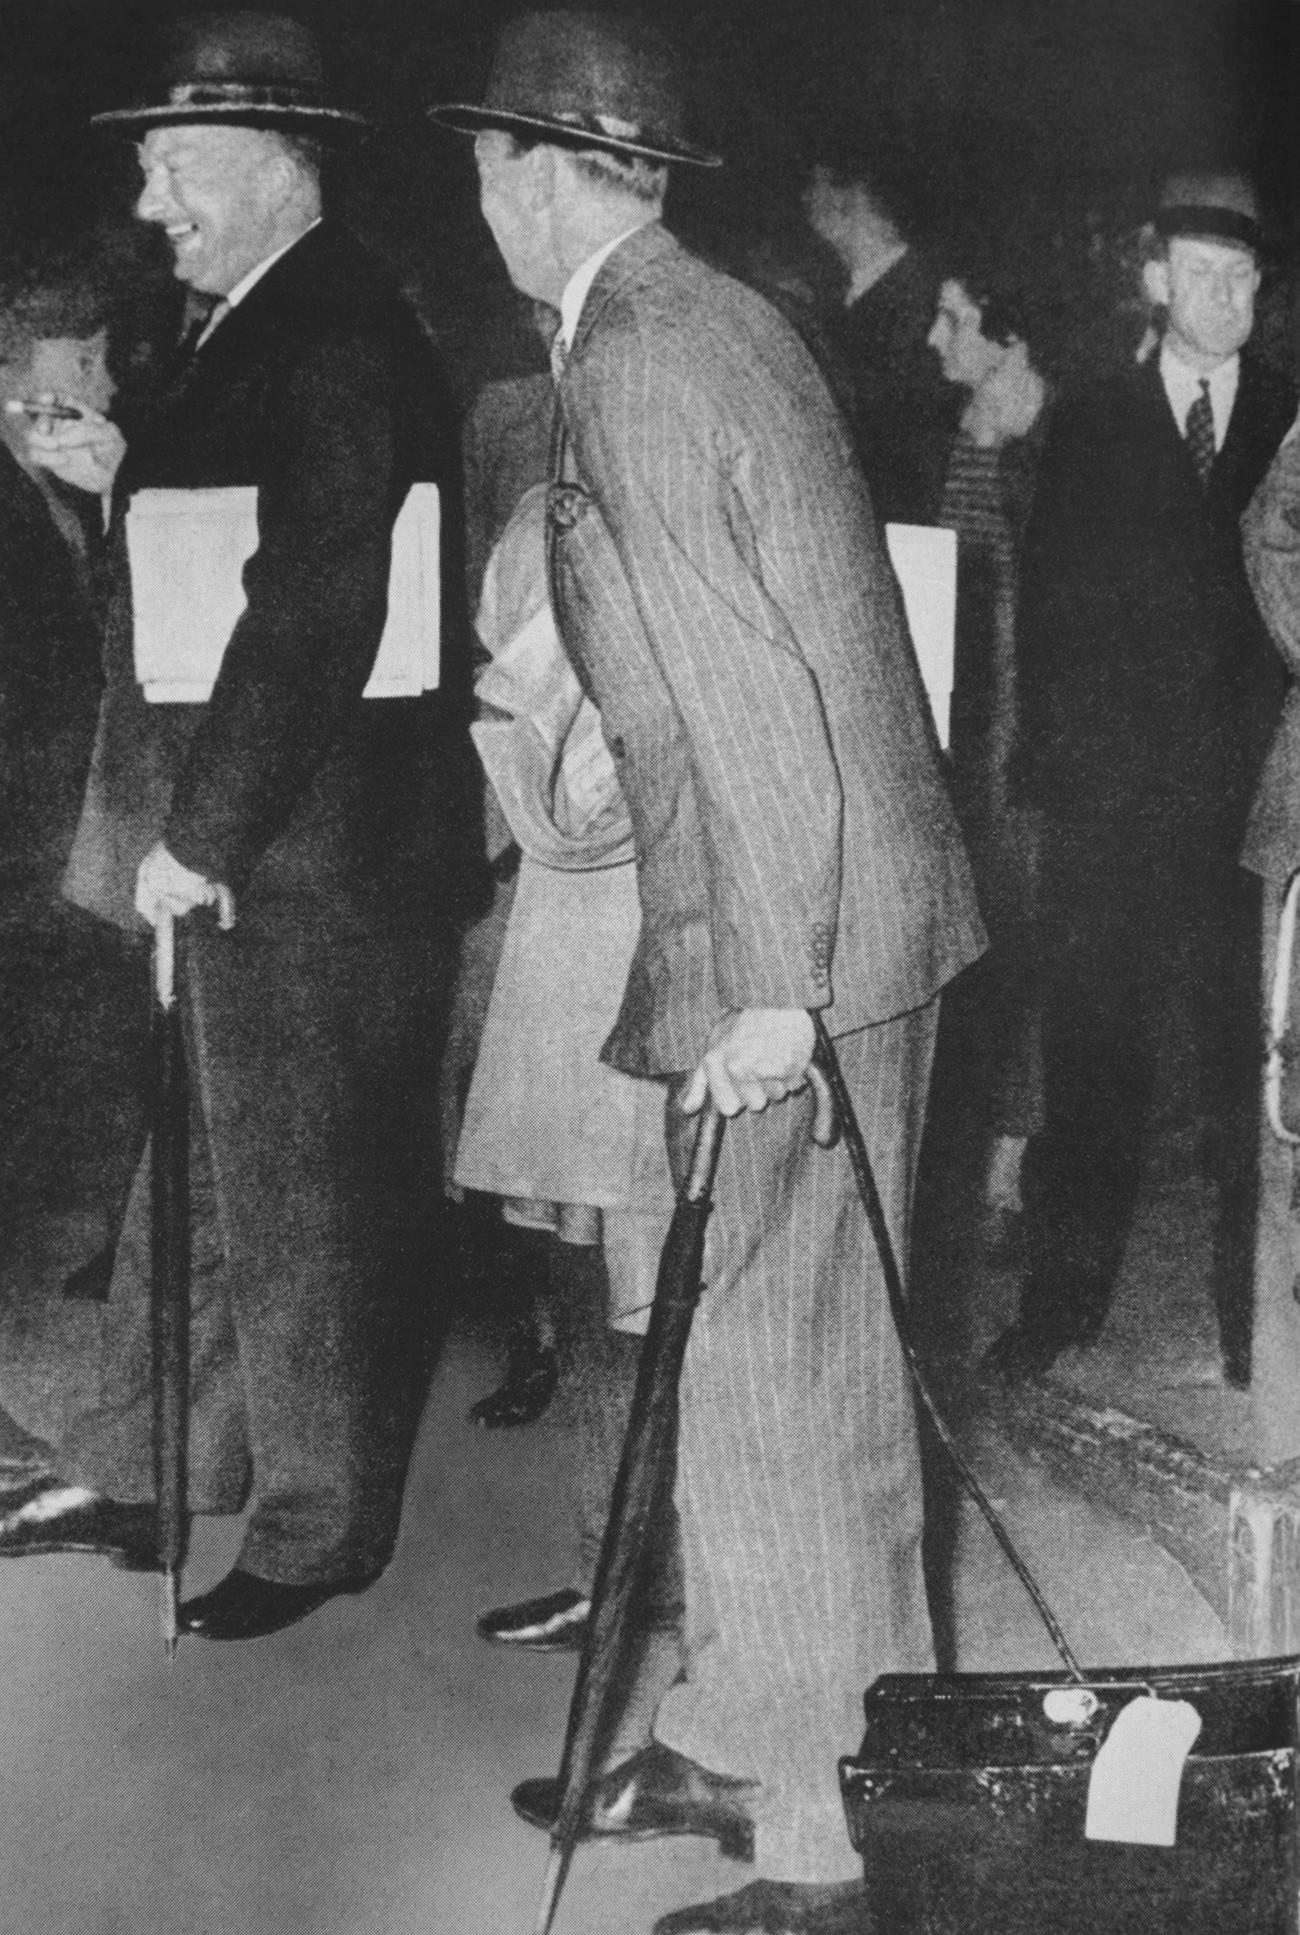 Admiral Reginald Drax und General Aimé Doumenc in Moskau